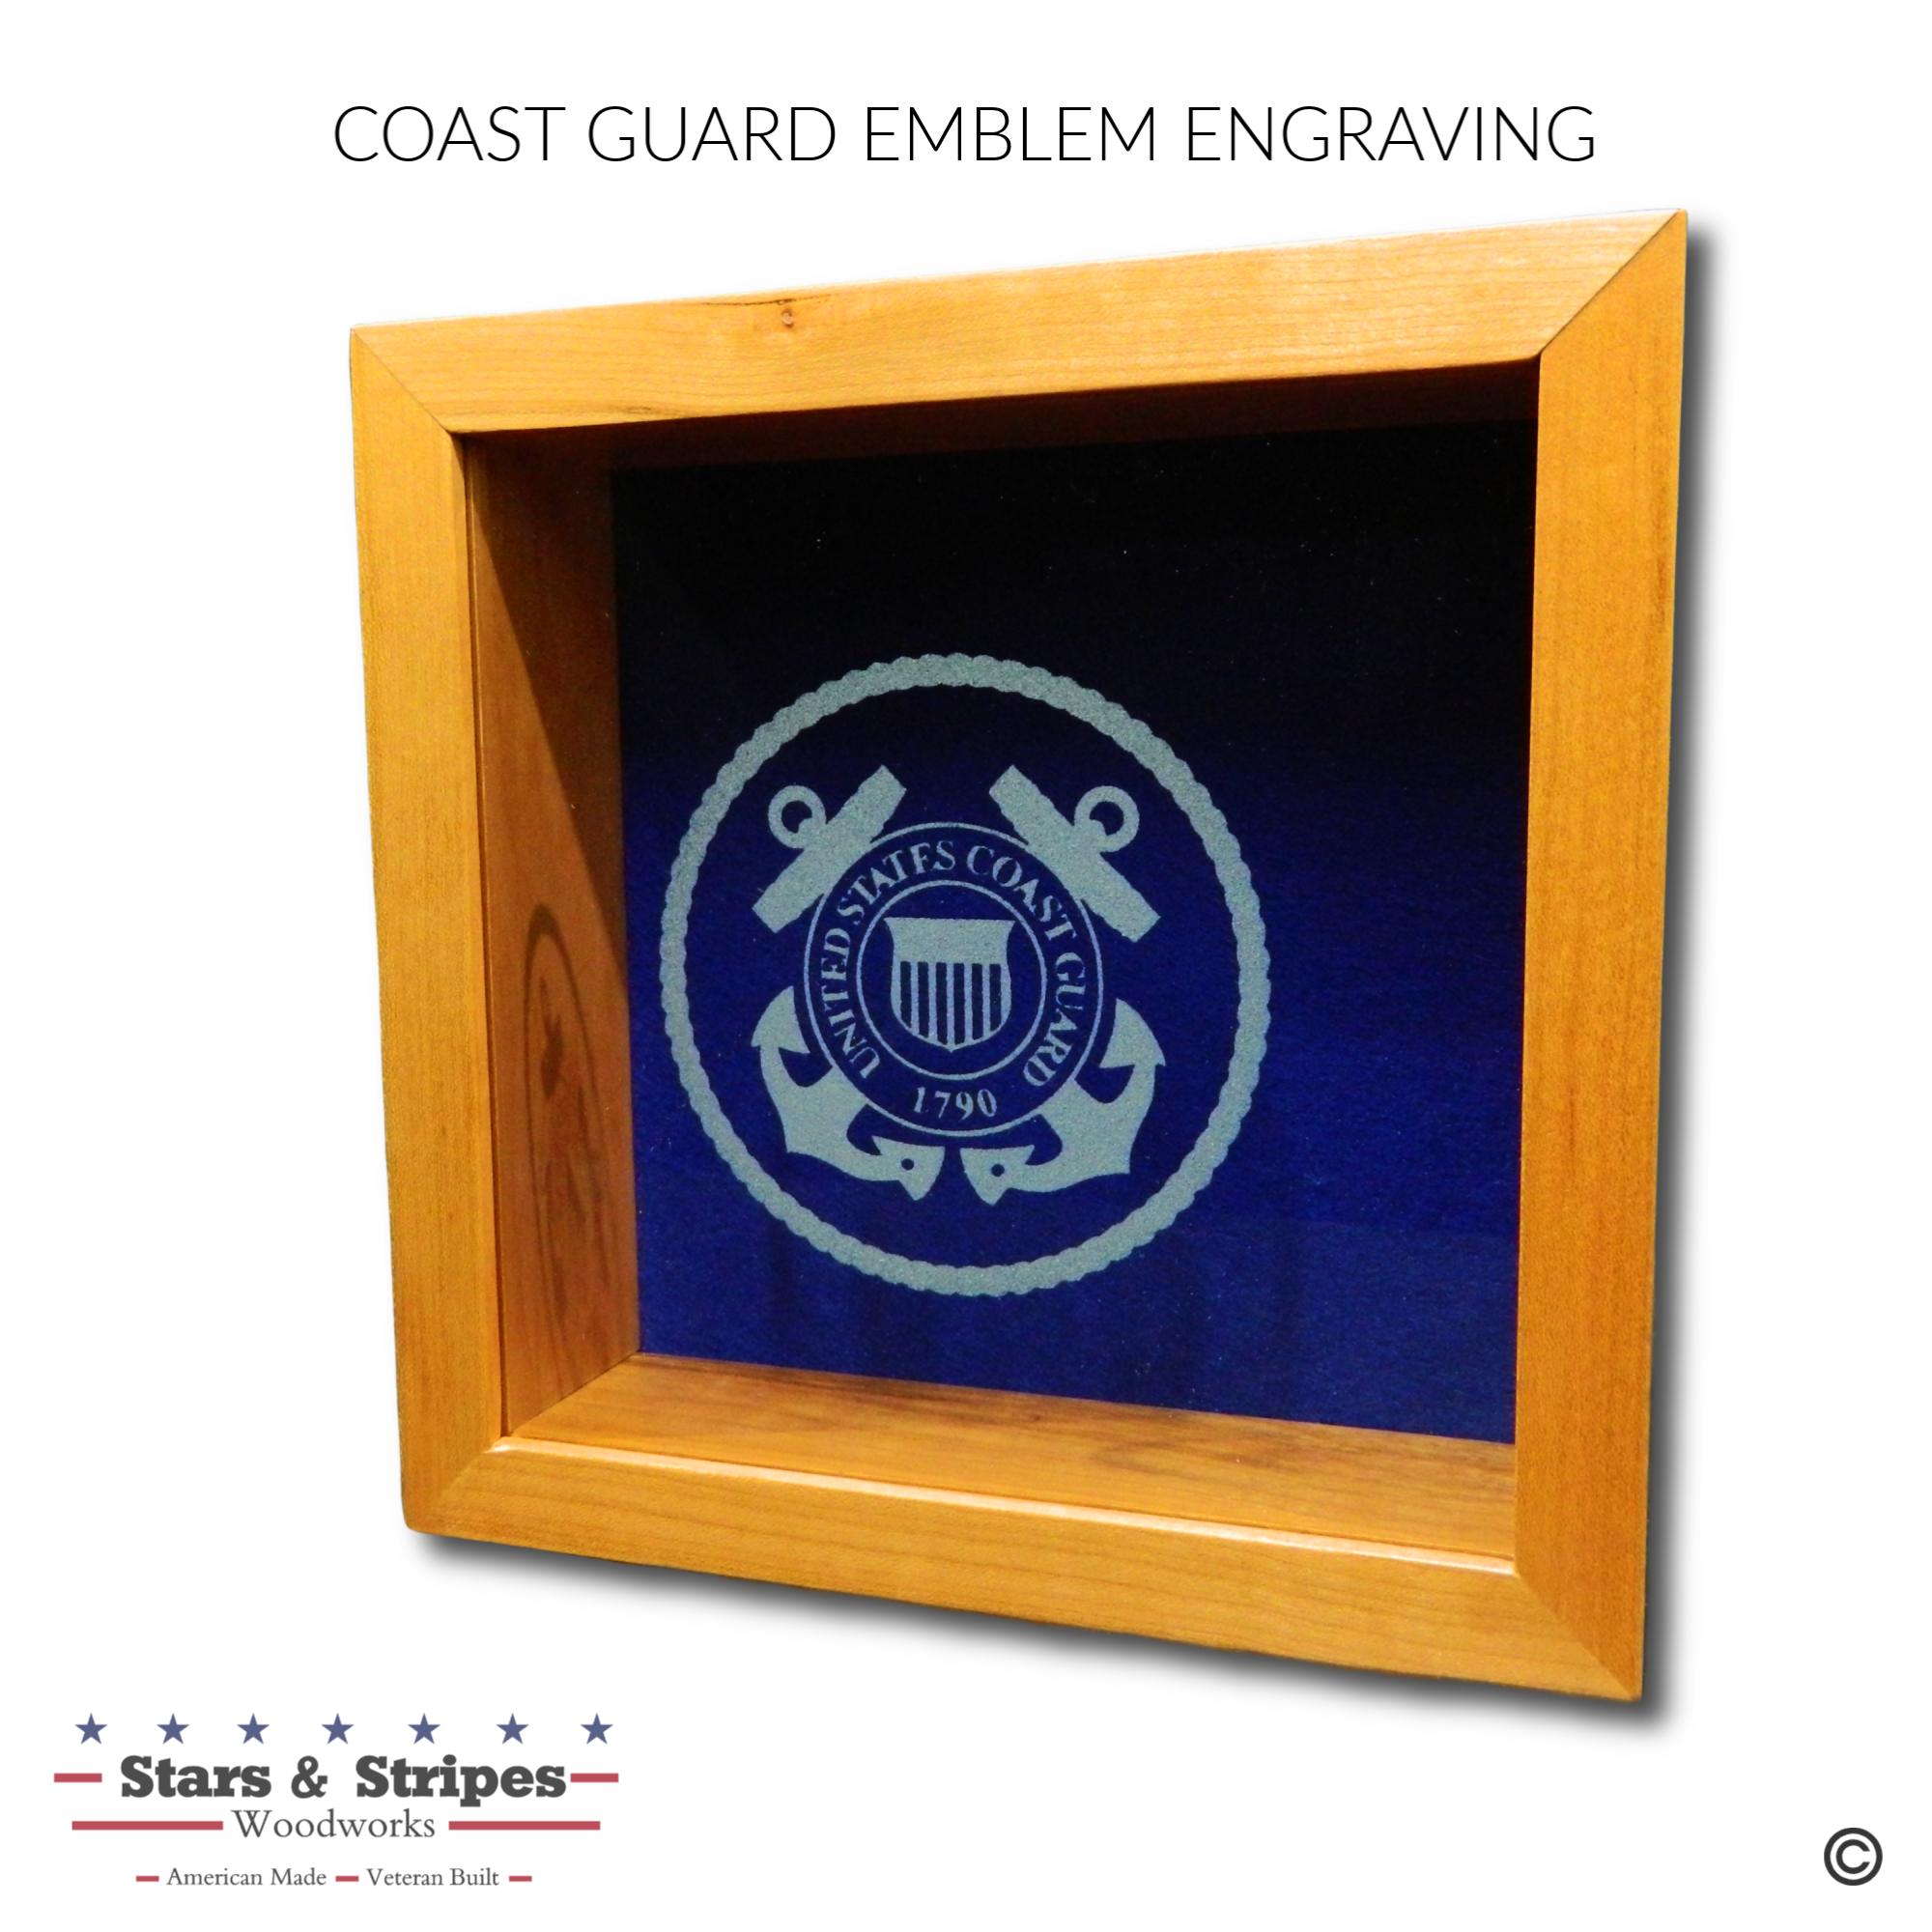 Coast Guard Emblem Glass Engraving Sampl